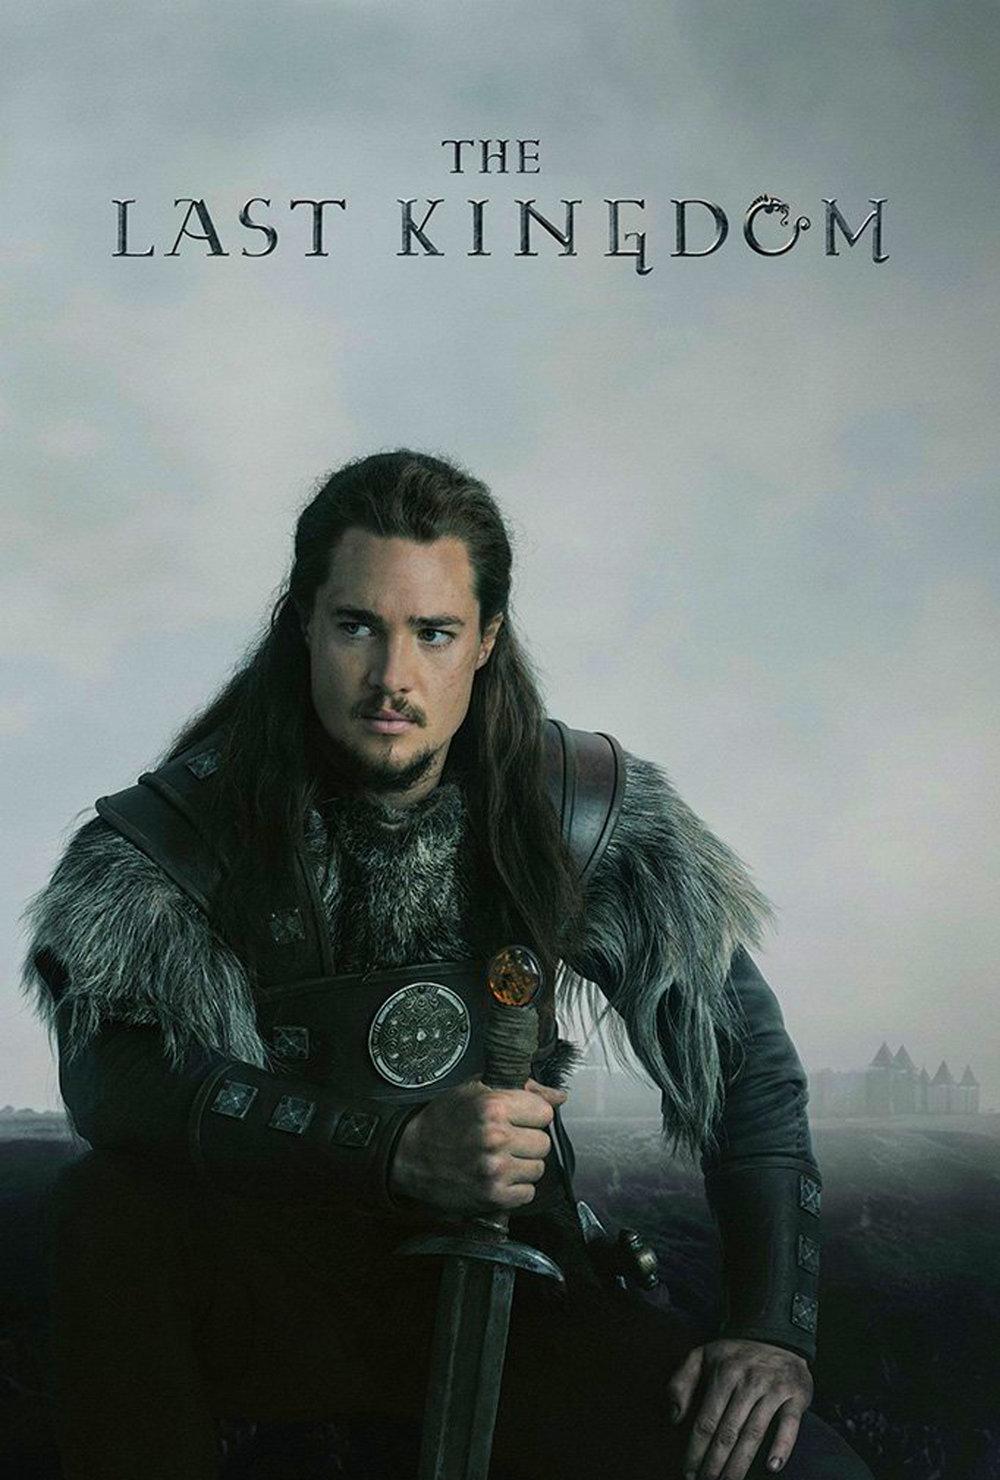 The Last Kingdom - Season 2 - TV 2017 - BlueBolt Ltd.